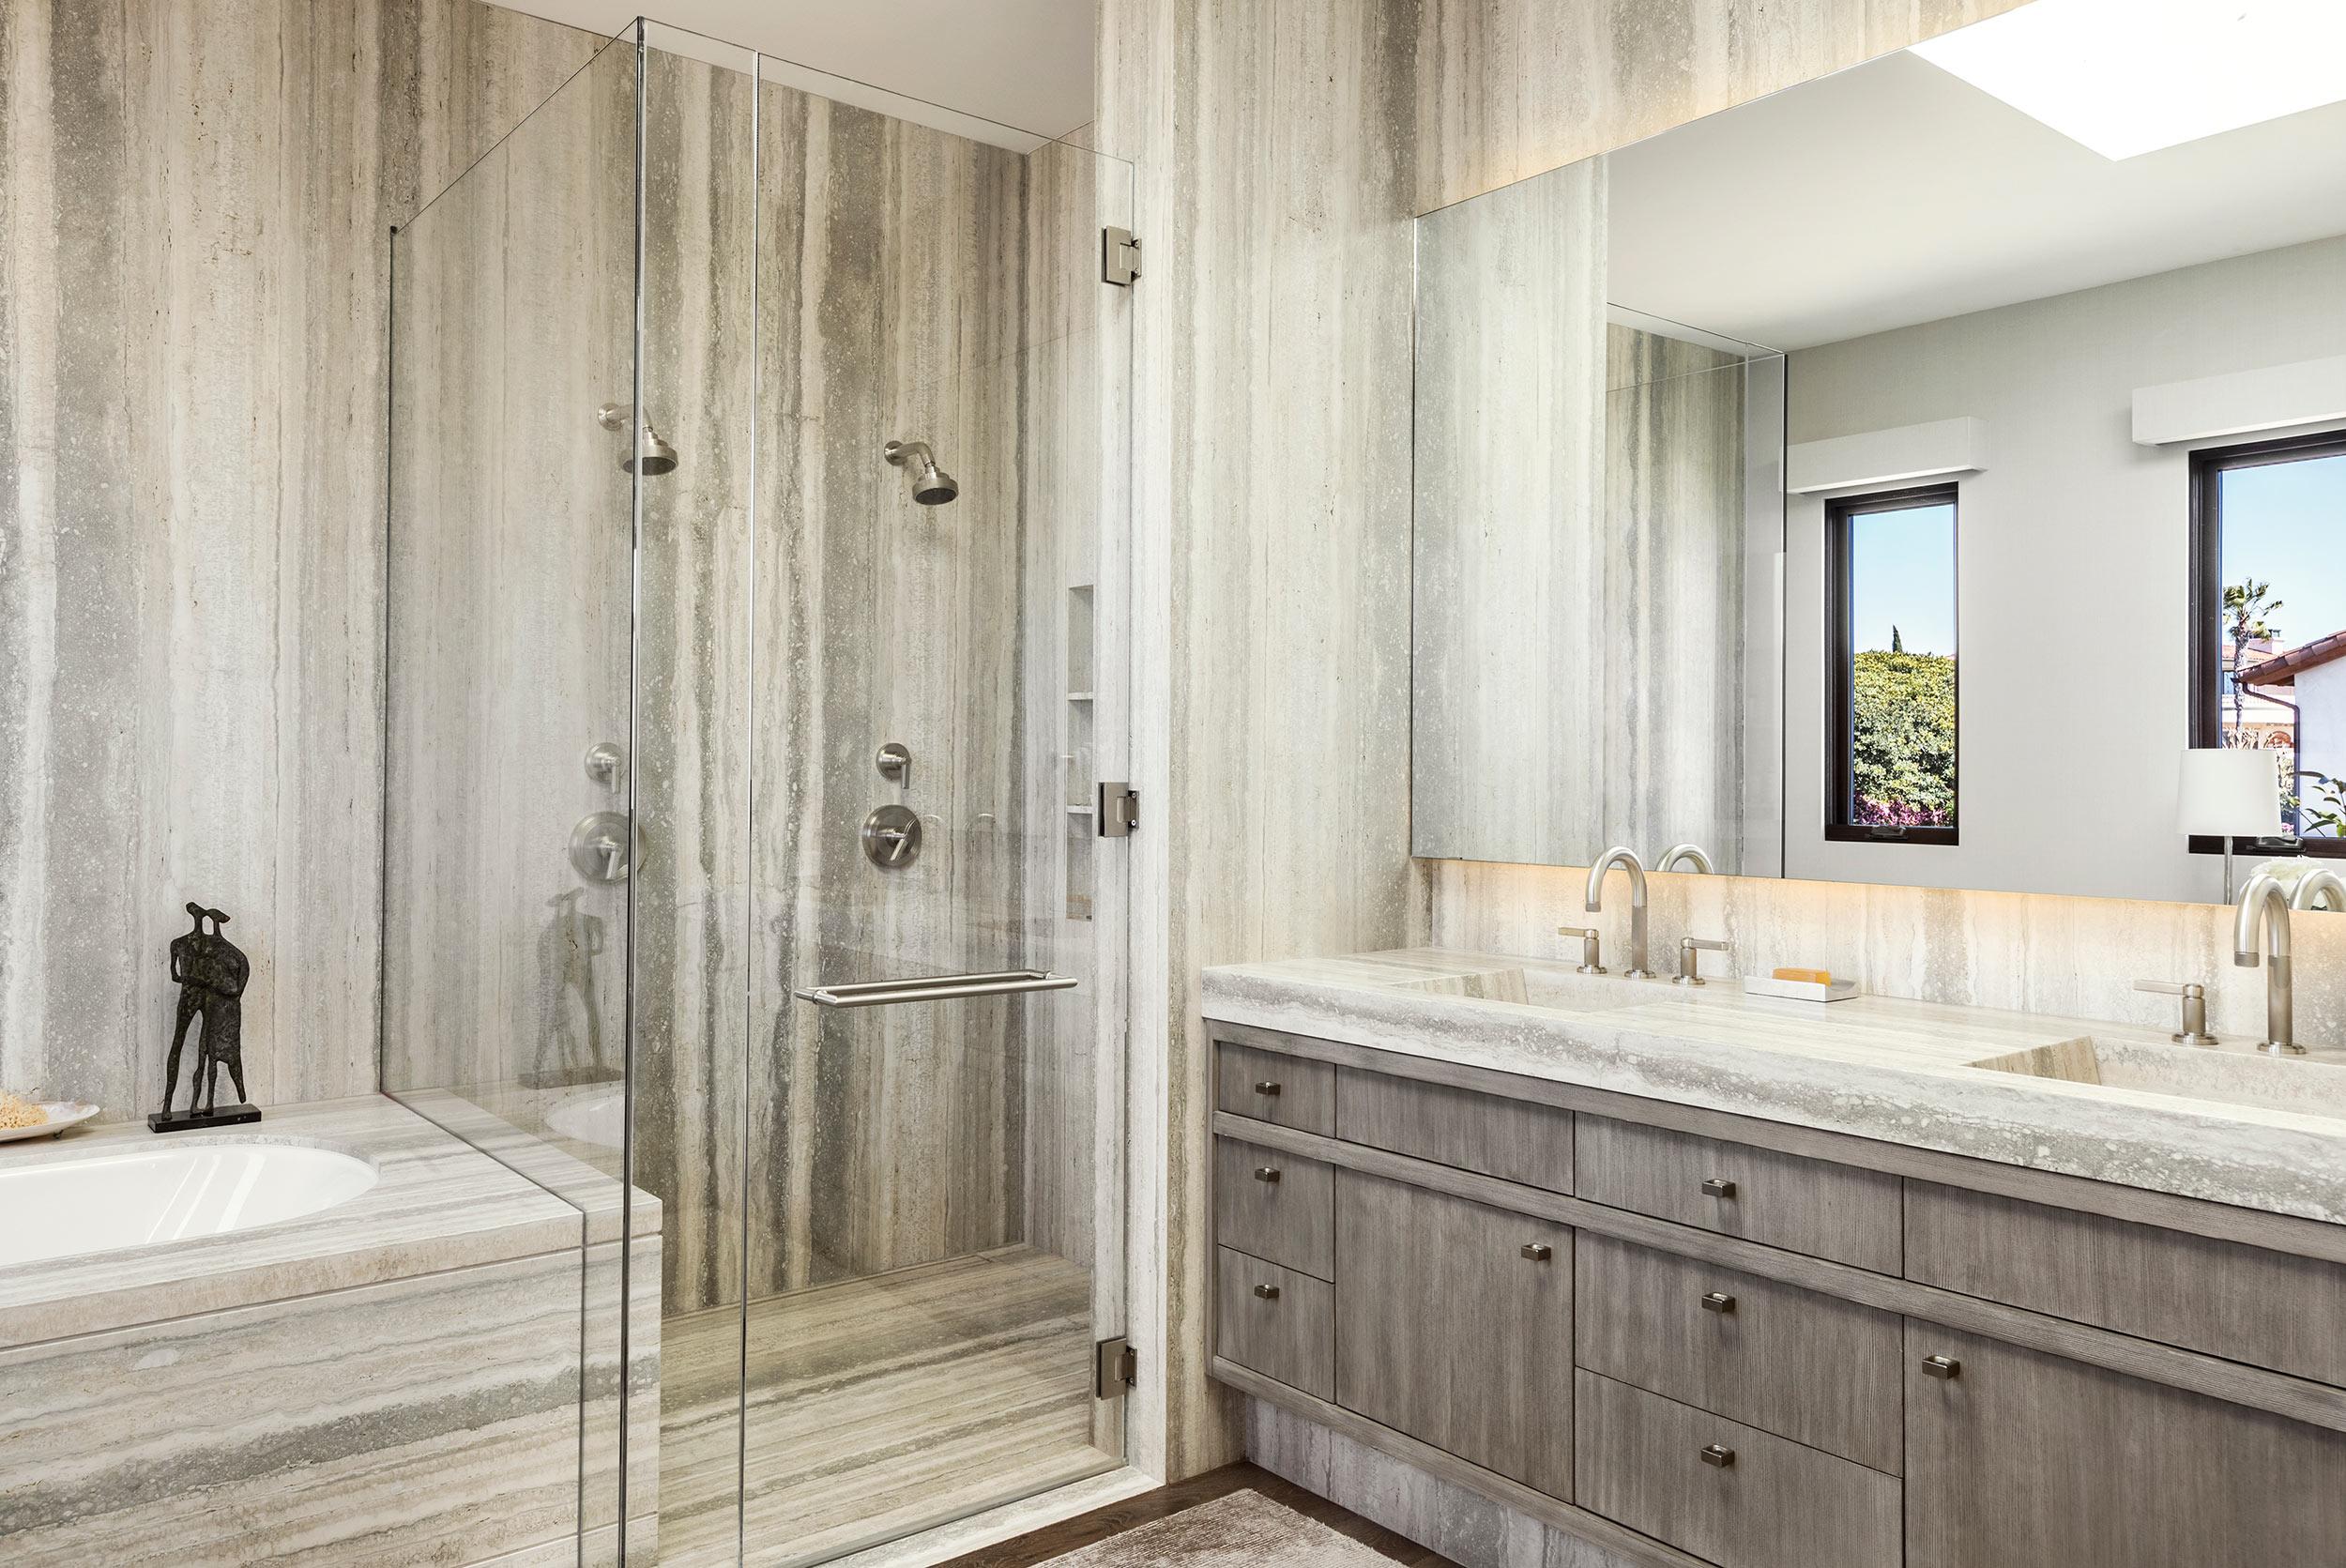 Stone and custom wood millwork shine in this custom master bathroom